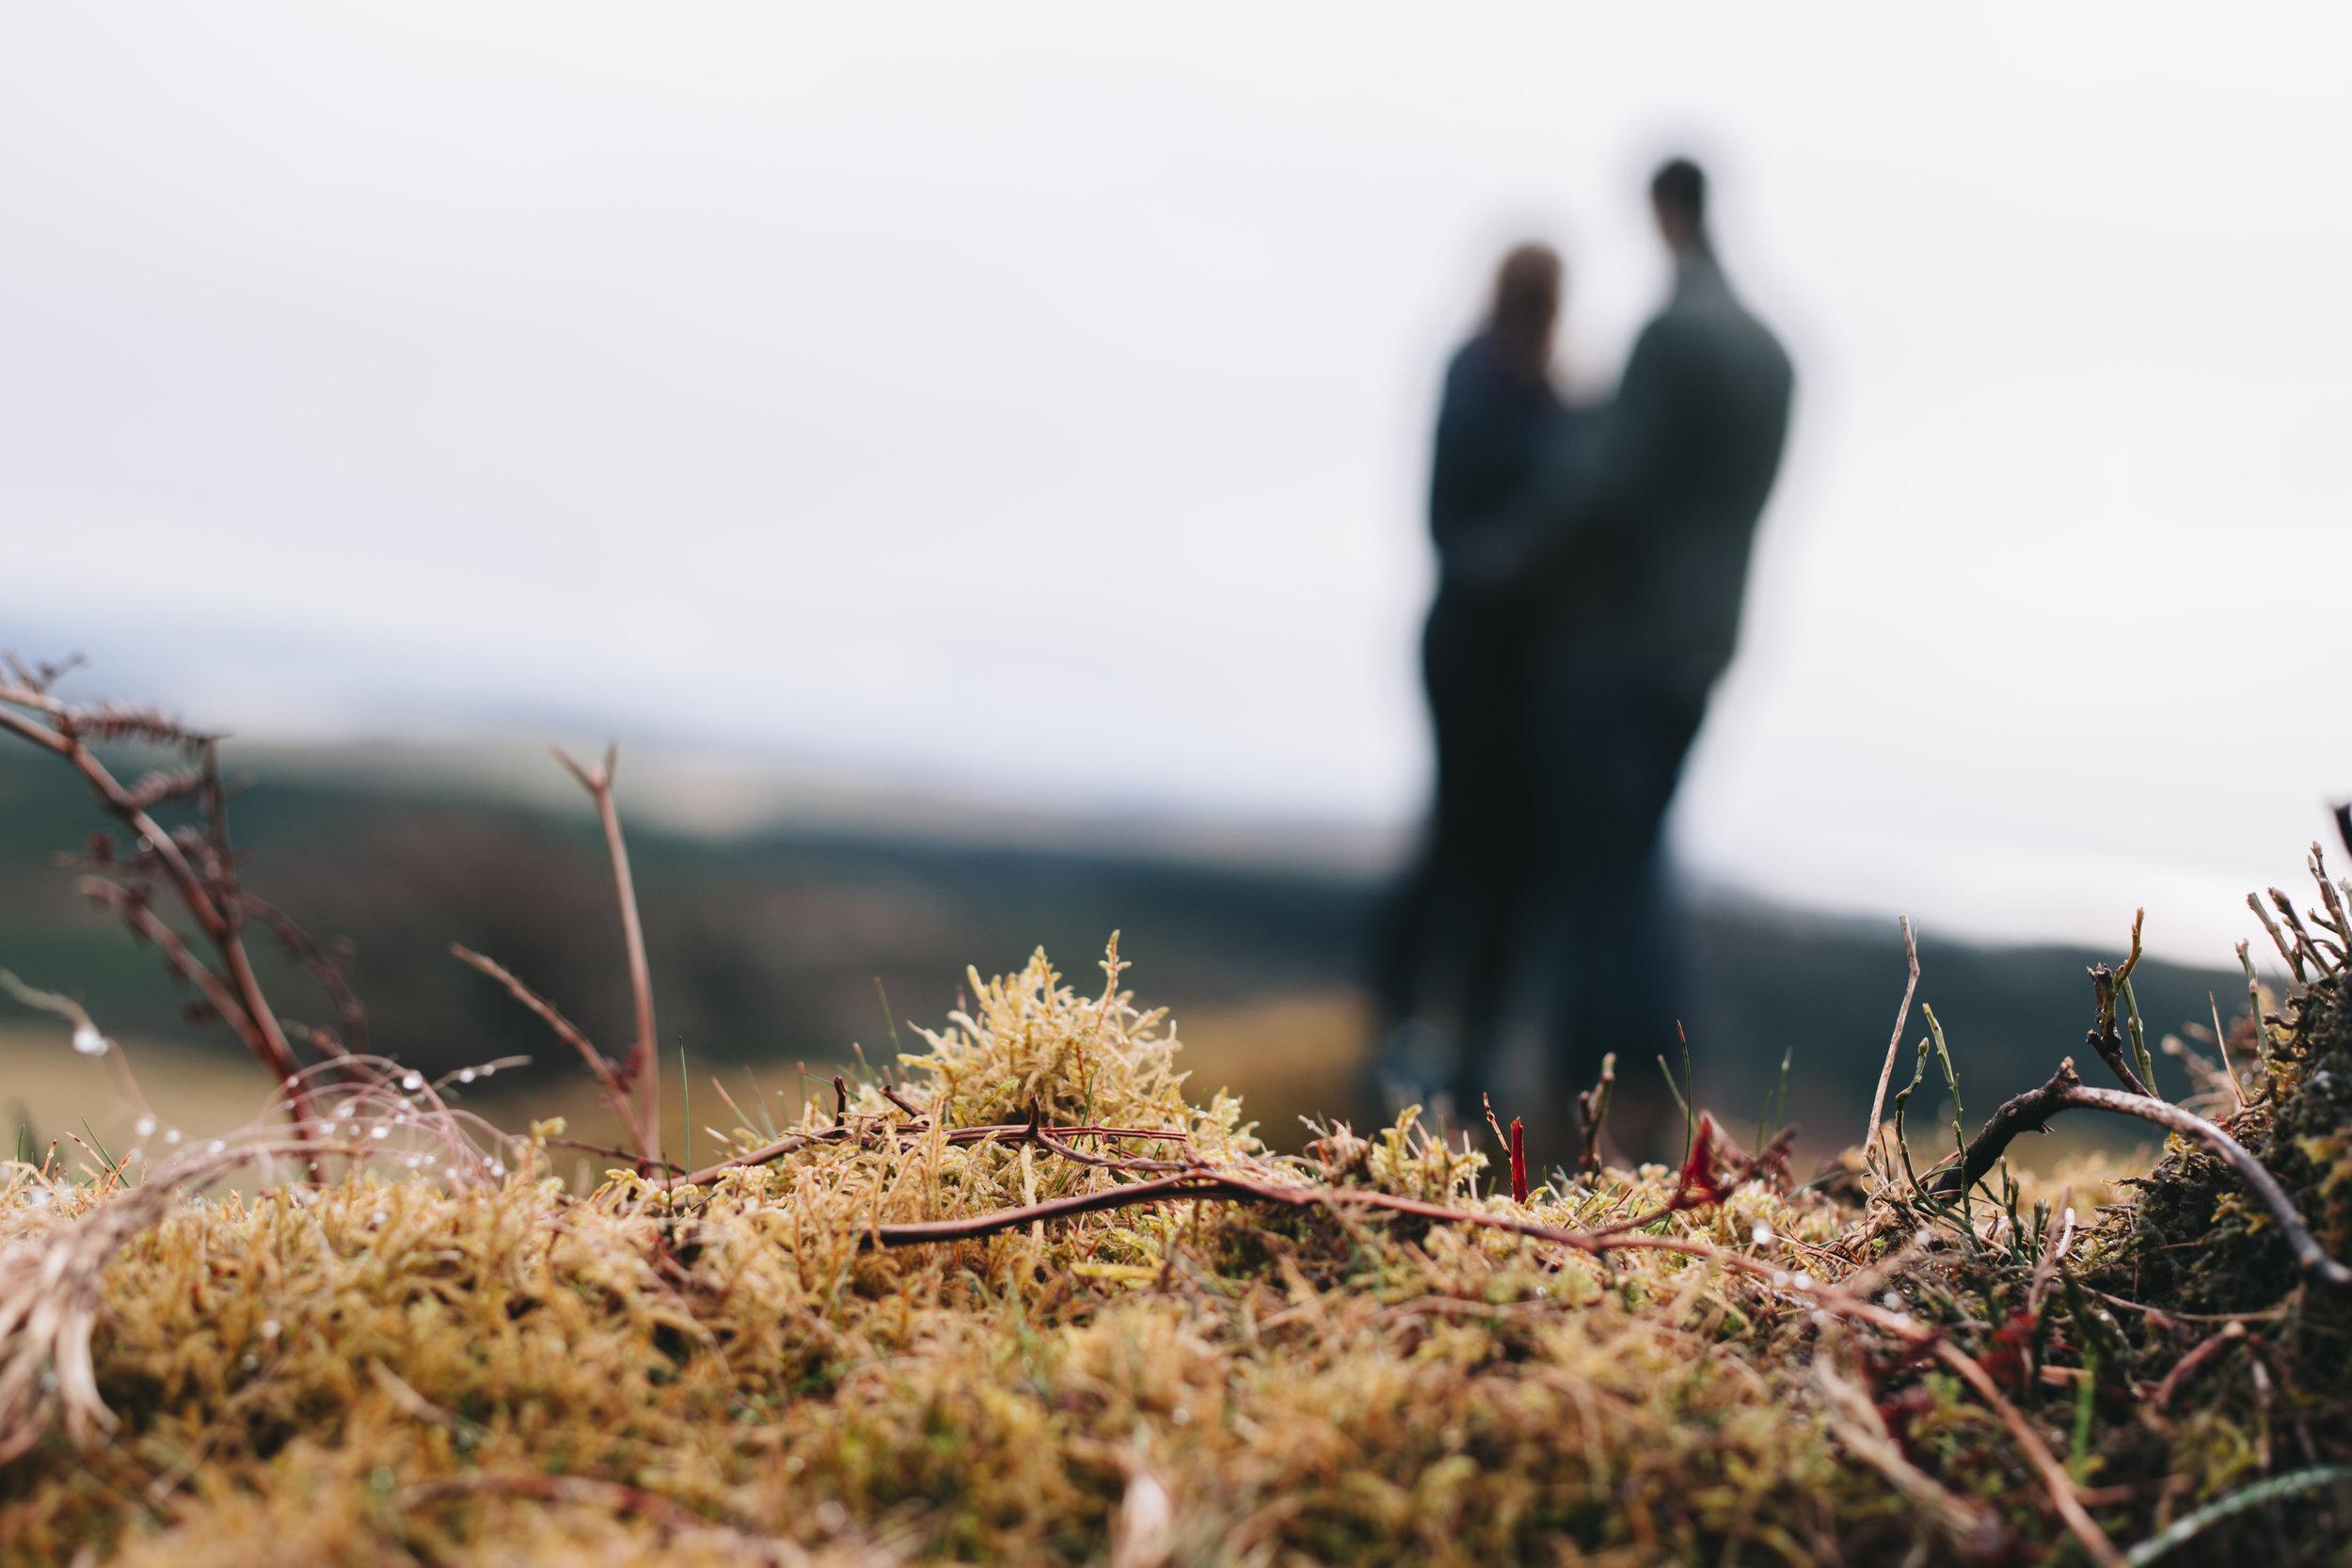 Alex + Matt - Windermere Engagement Photography - Claire Basiuk - 07.jpg